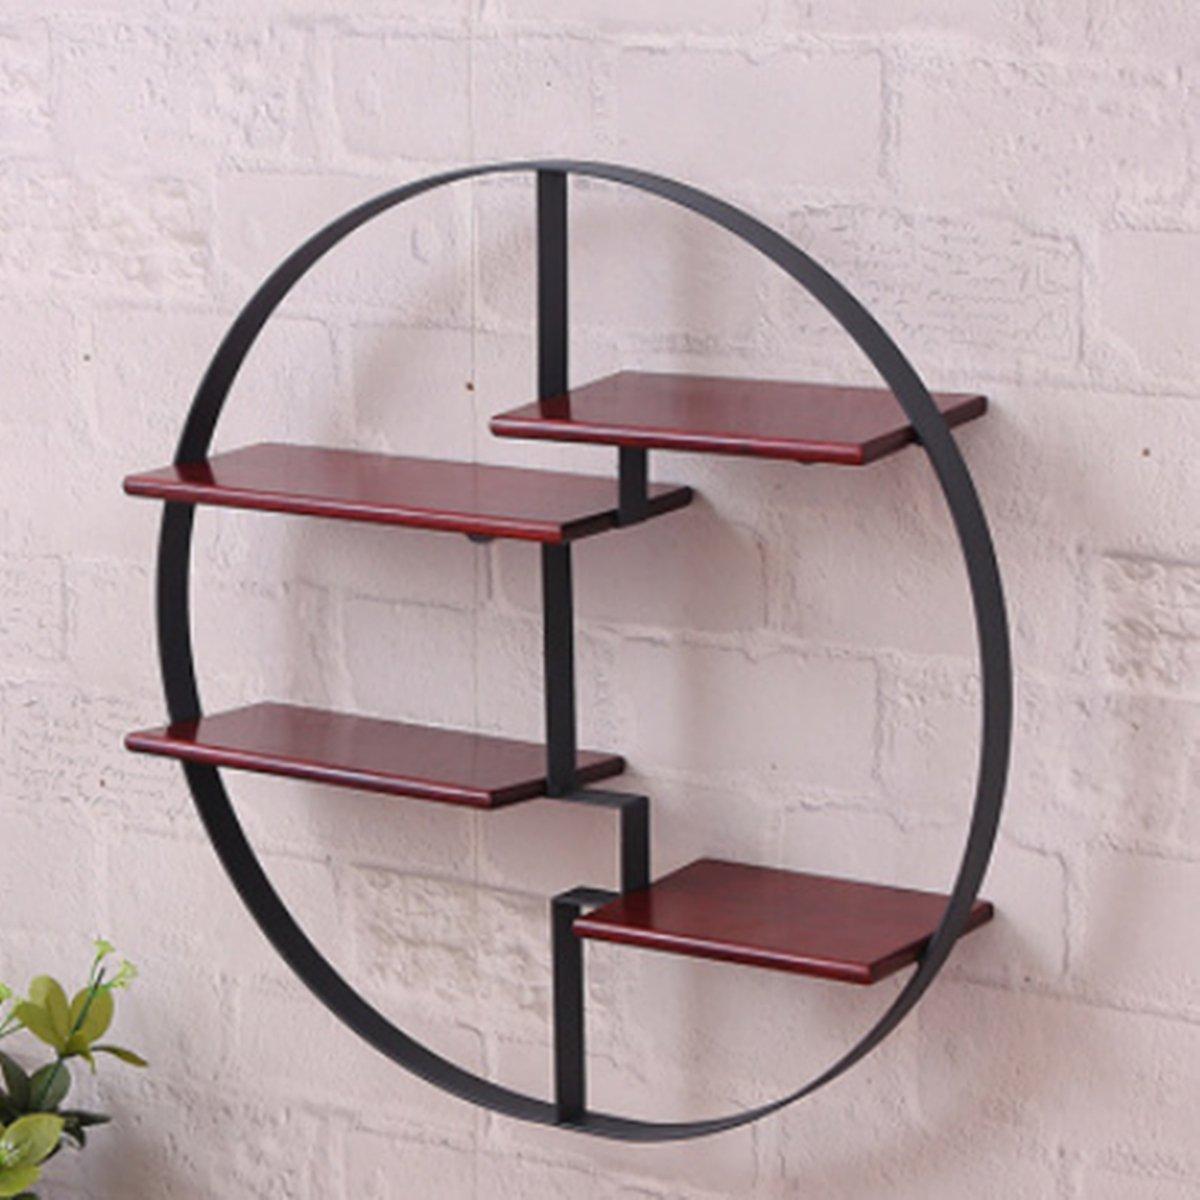 KINGSO Round Wall Unit Retro Wood Industrial Style Metal Shelf Rack Storage Black Black